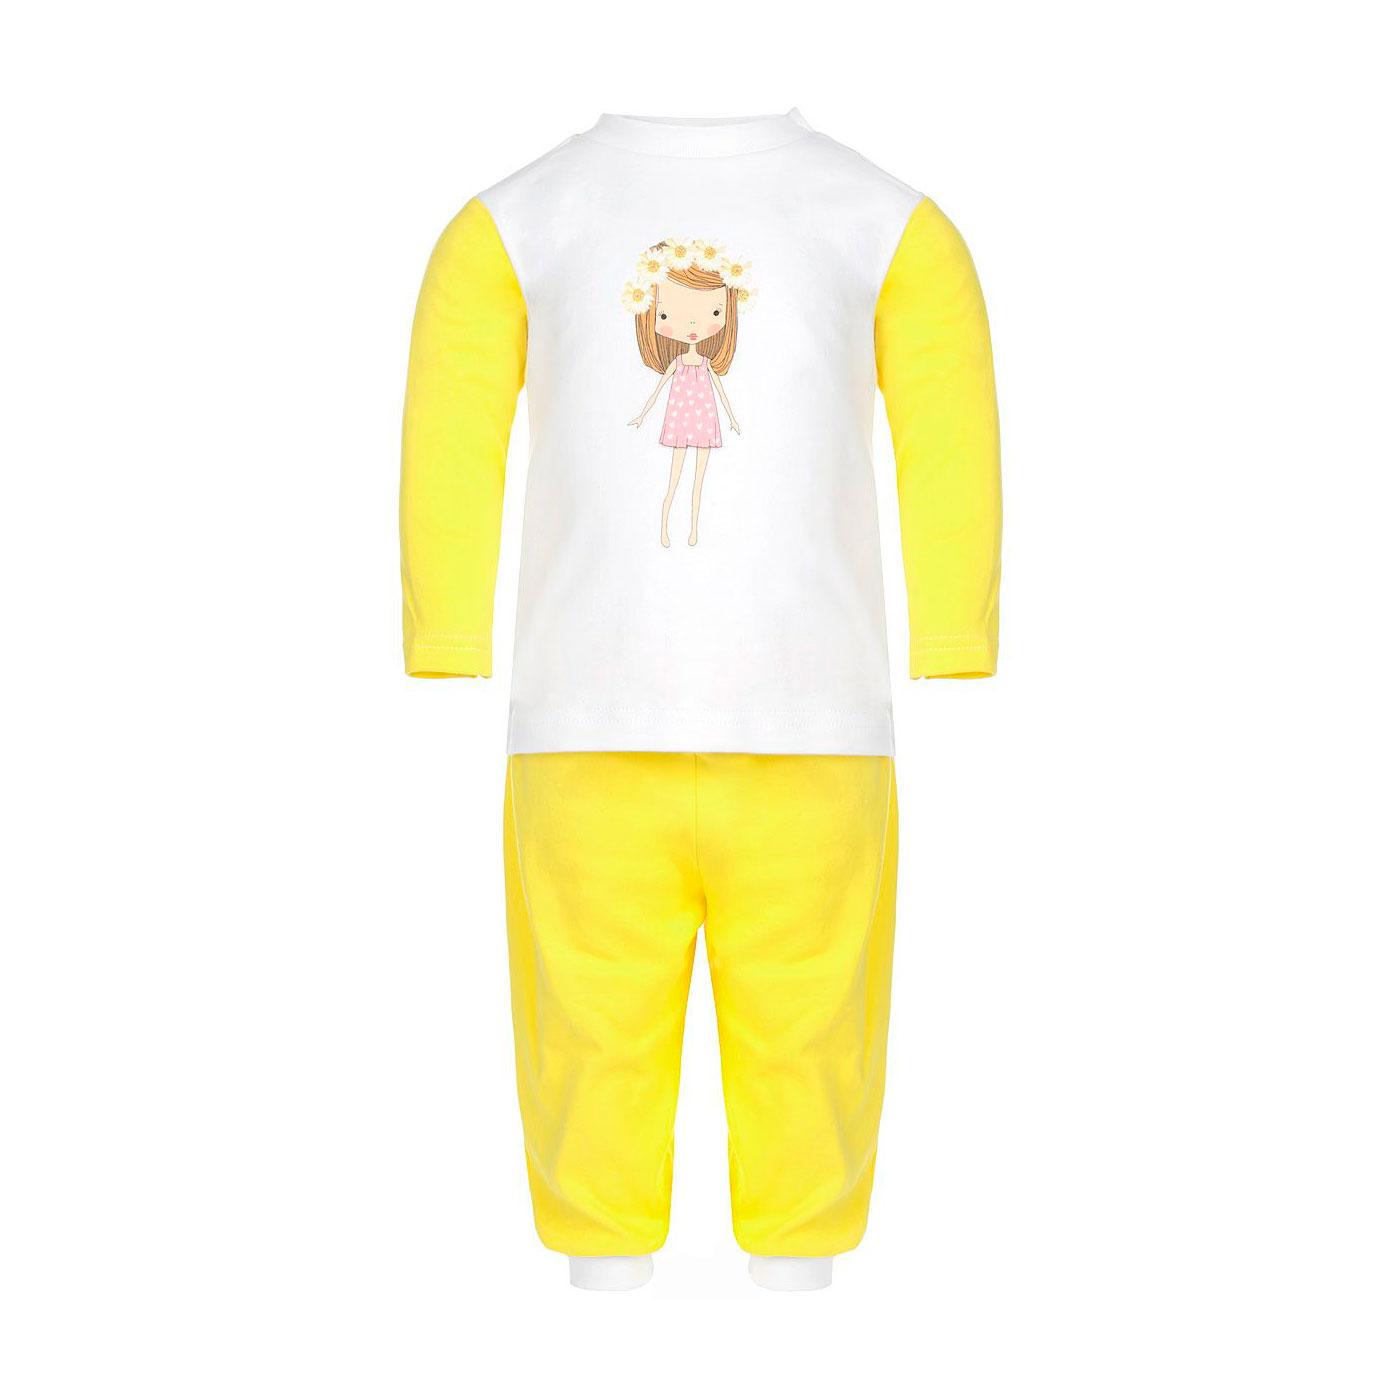 Пижама Котмаркот Ромашки рост 86 желтый<br>